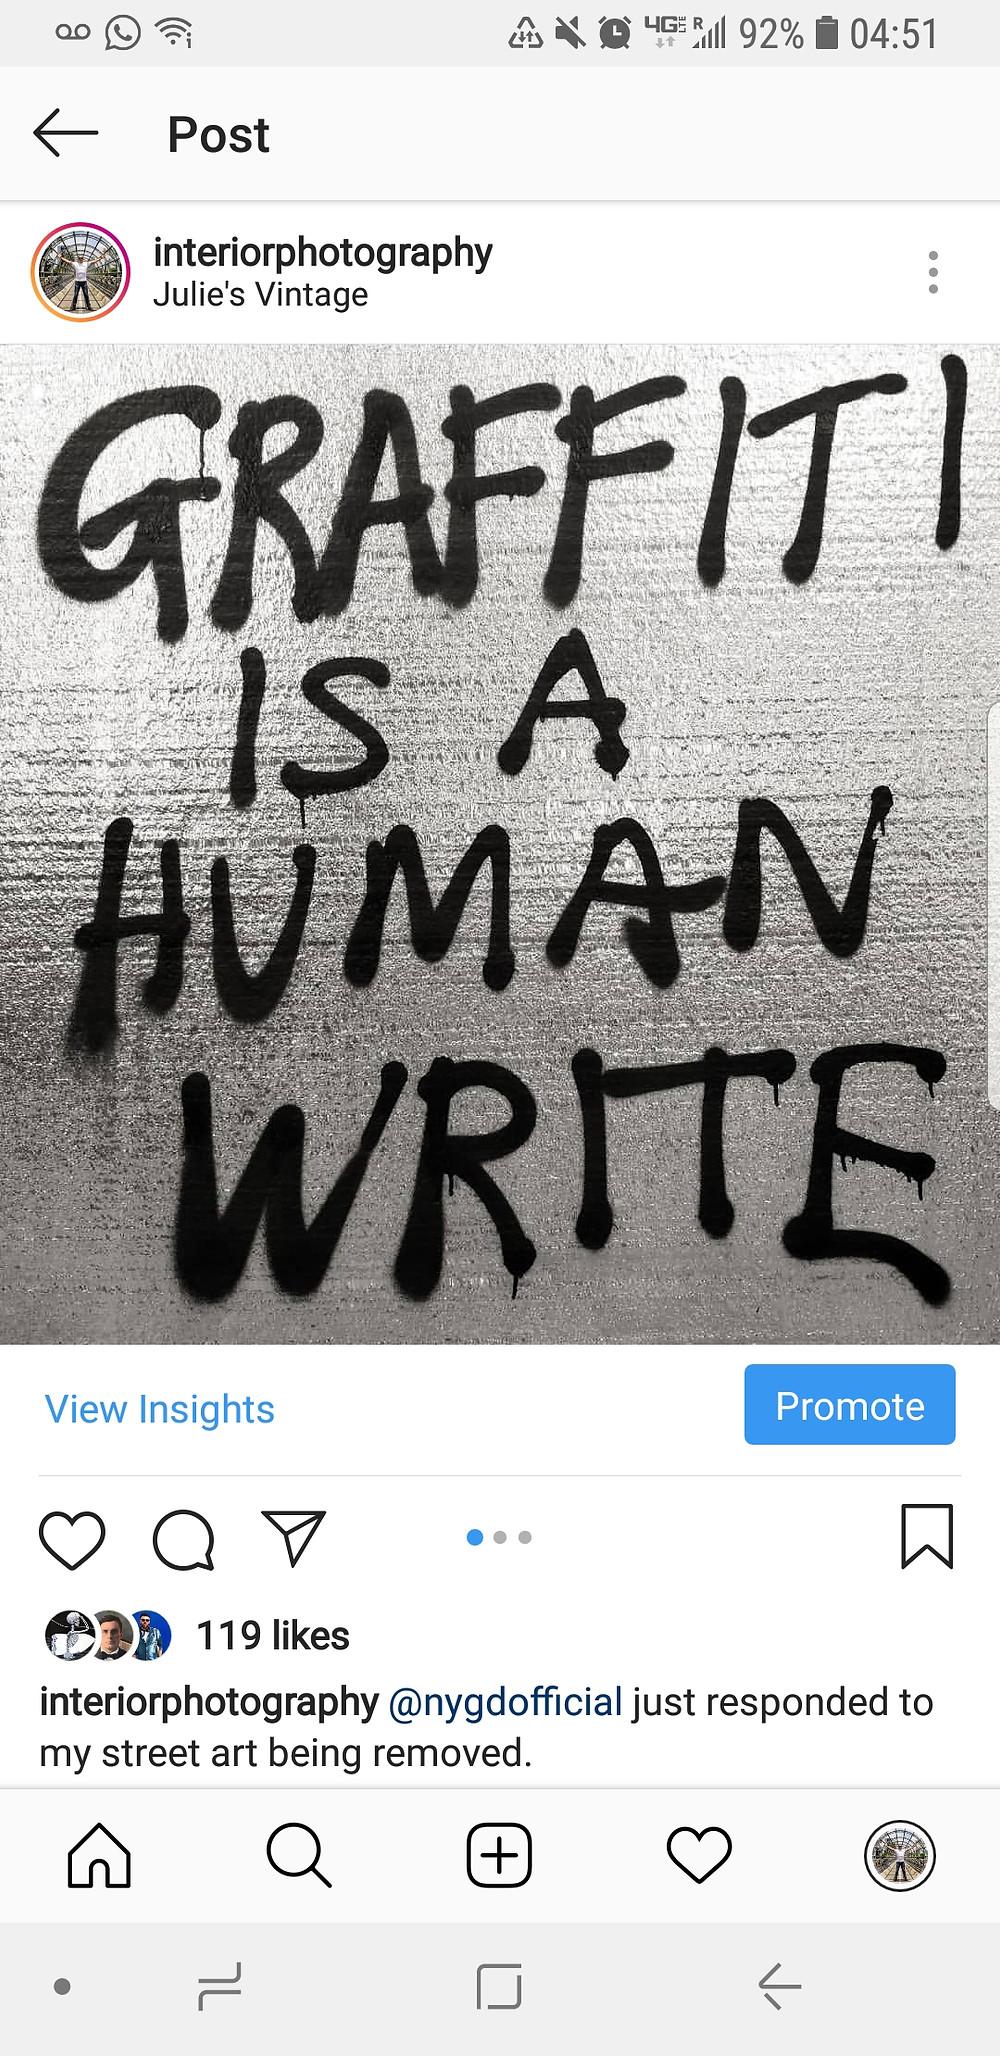 Instagram post- interiorphotography: Graffiti is a human write